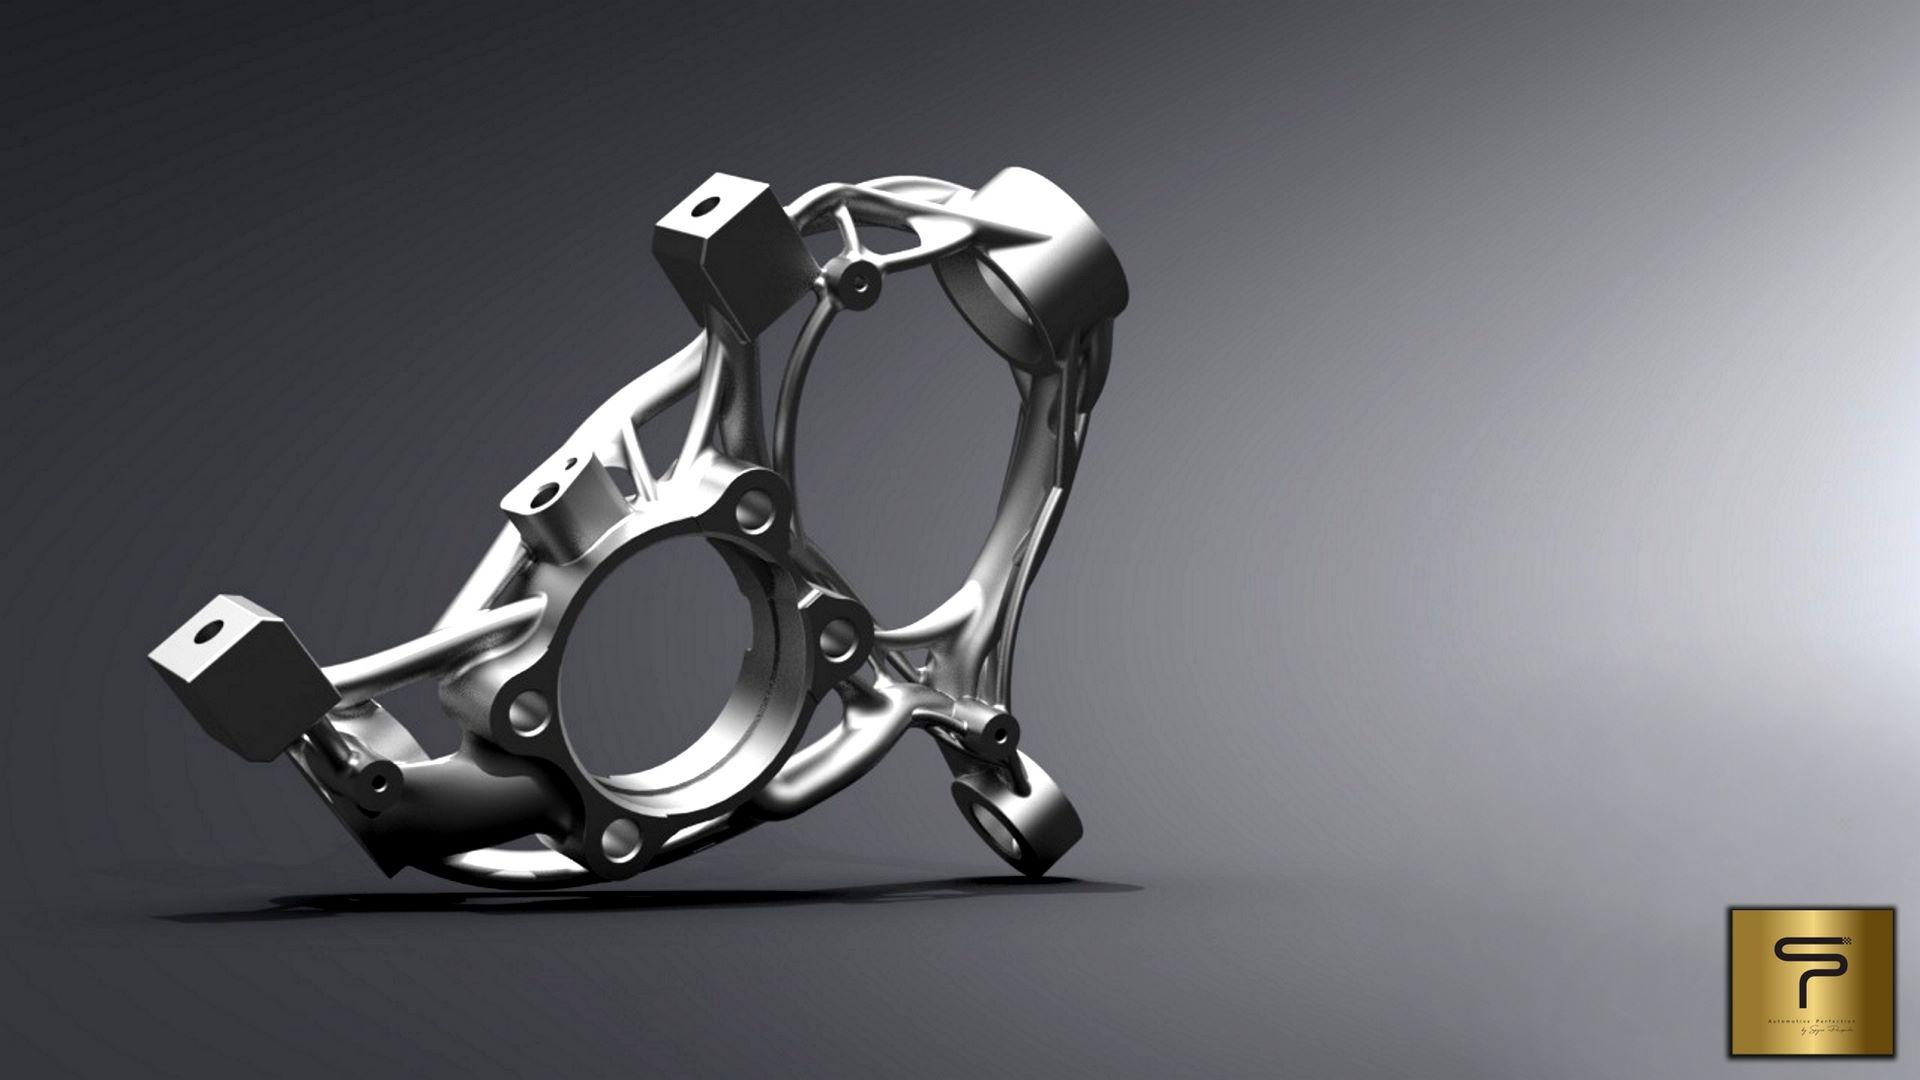 Spyros-Panopoulos-Automotive-Chaos-51